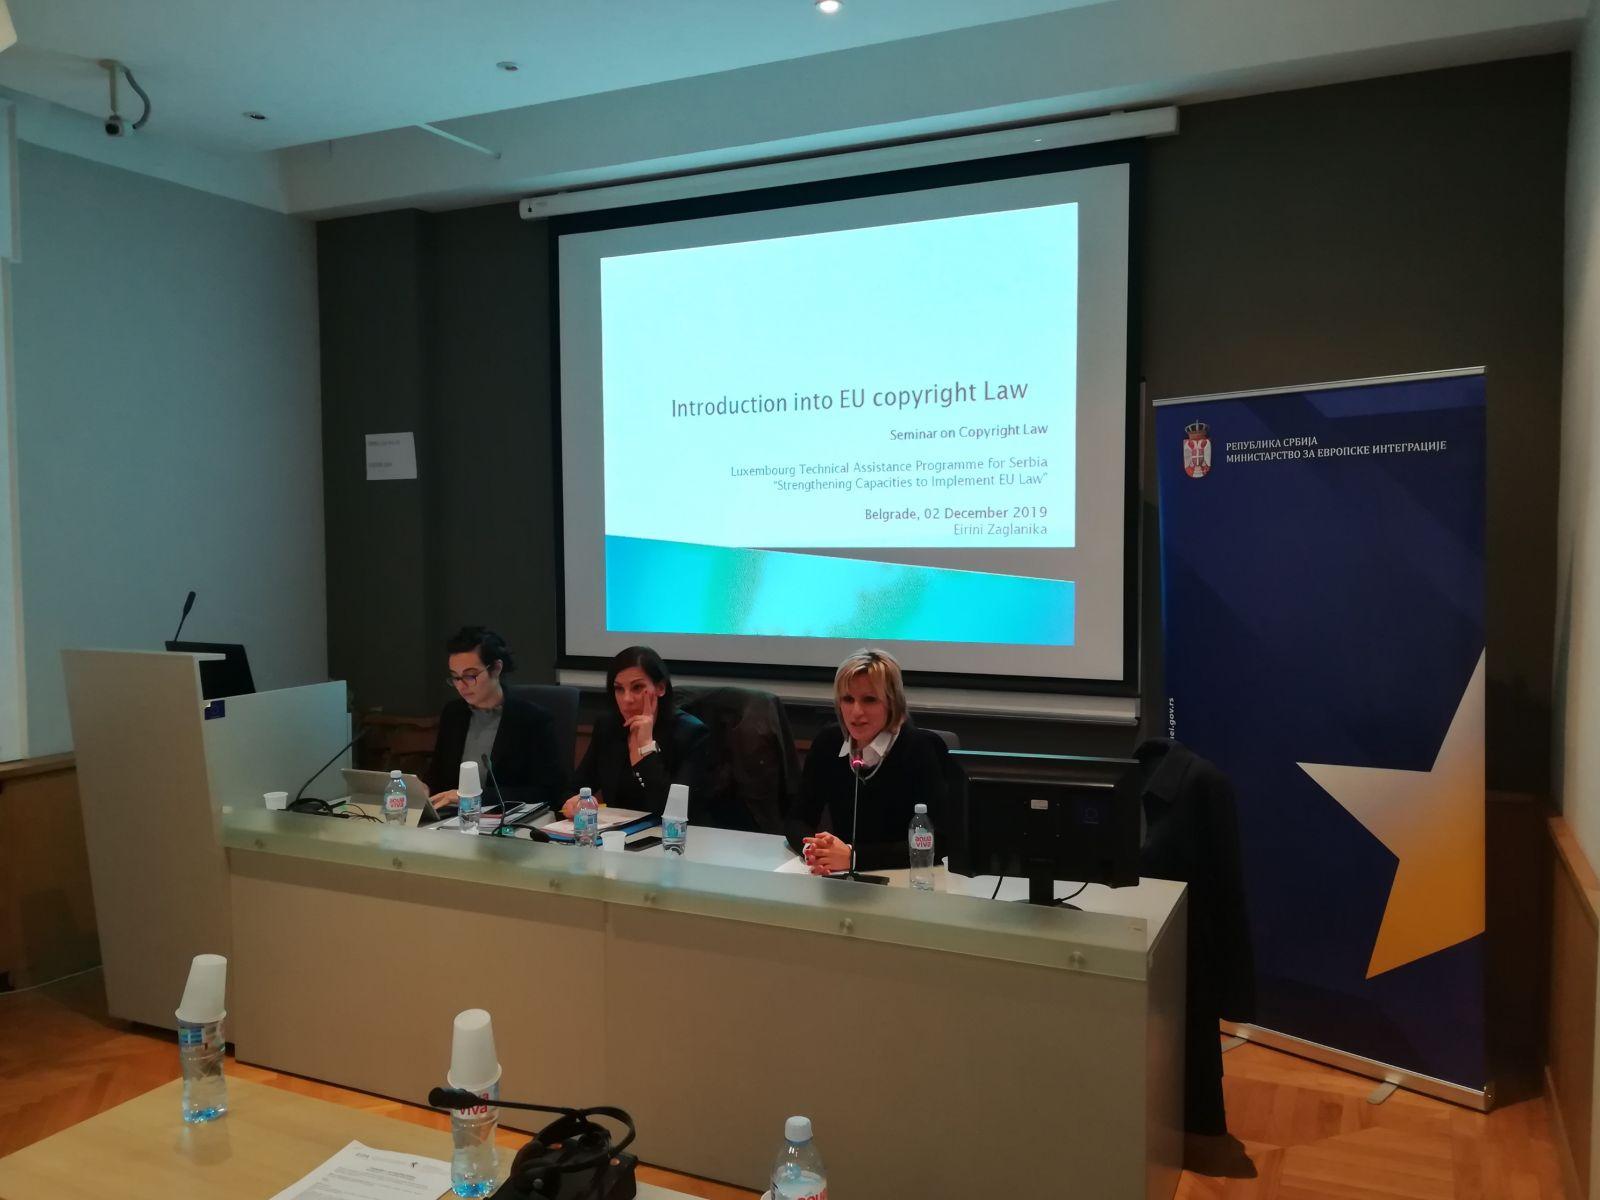 Copyright seminar opened